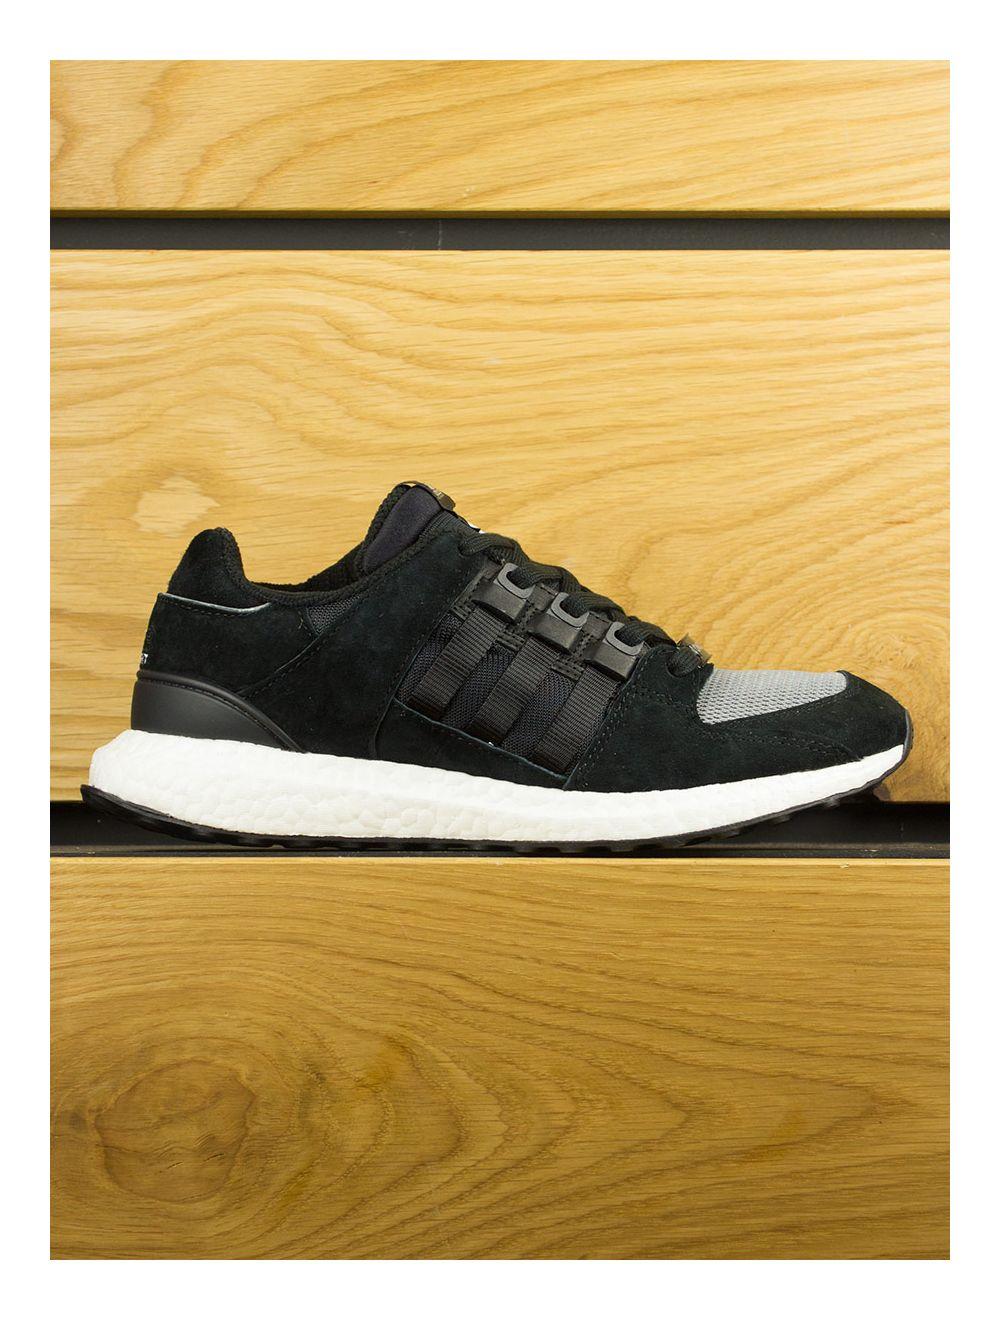 sale retailer 109f5 6cdab Adidas Consortium x Concepts EQT Support 93/16 Ultra Boost - White Black